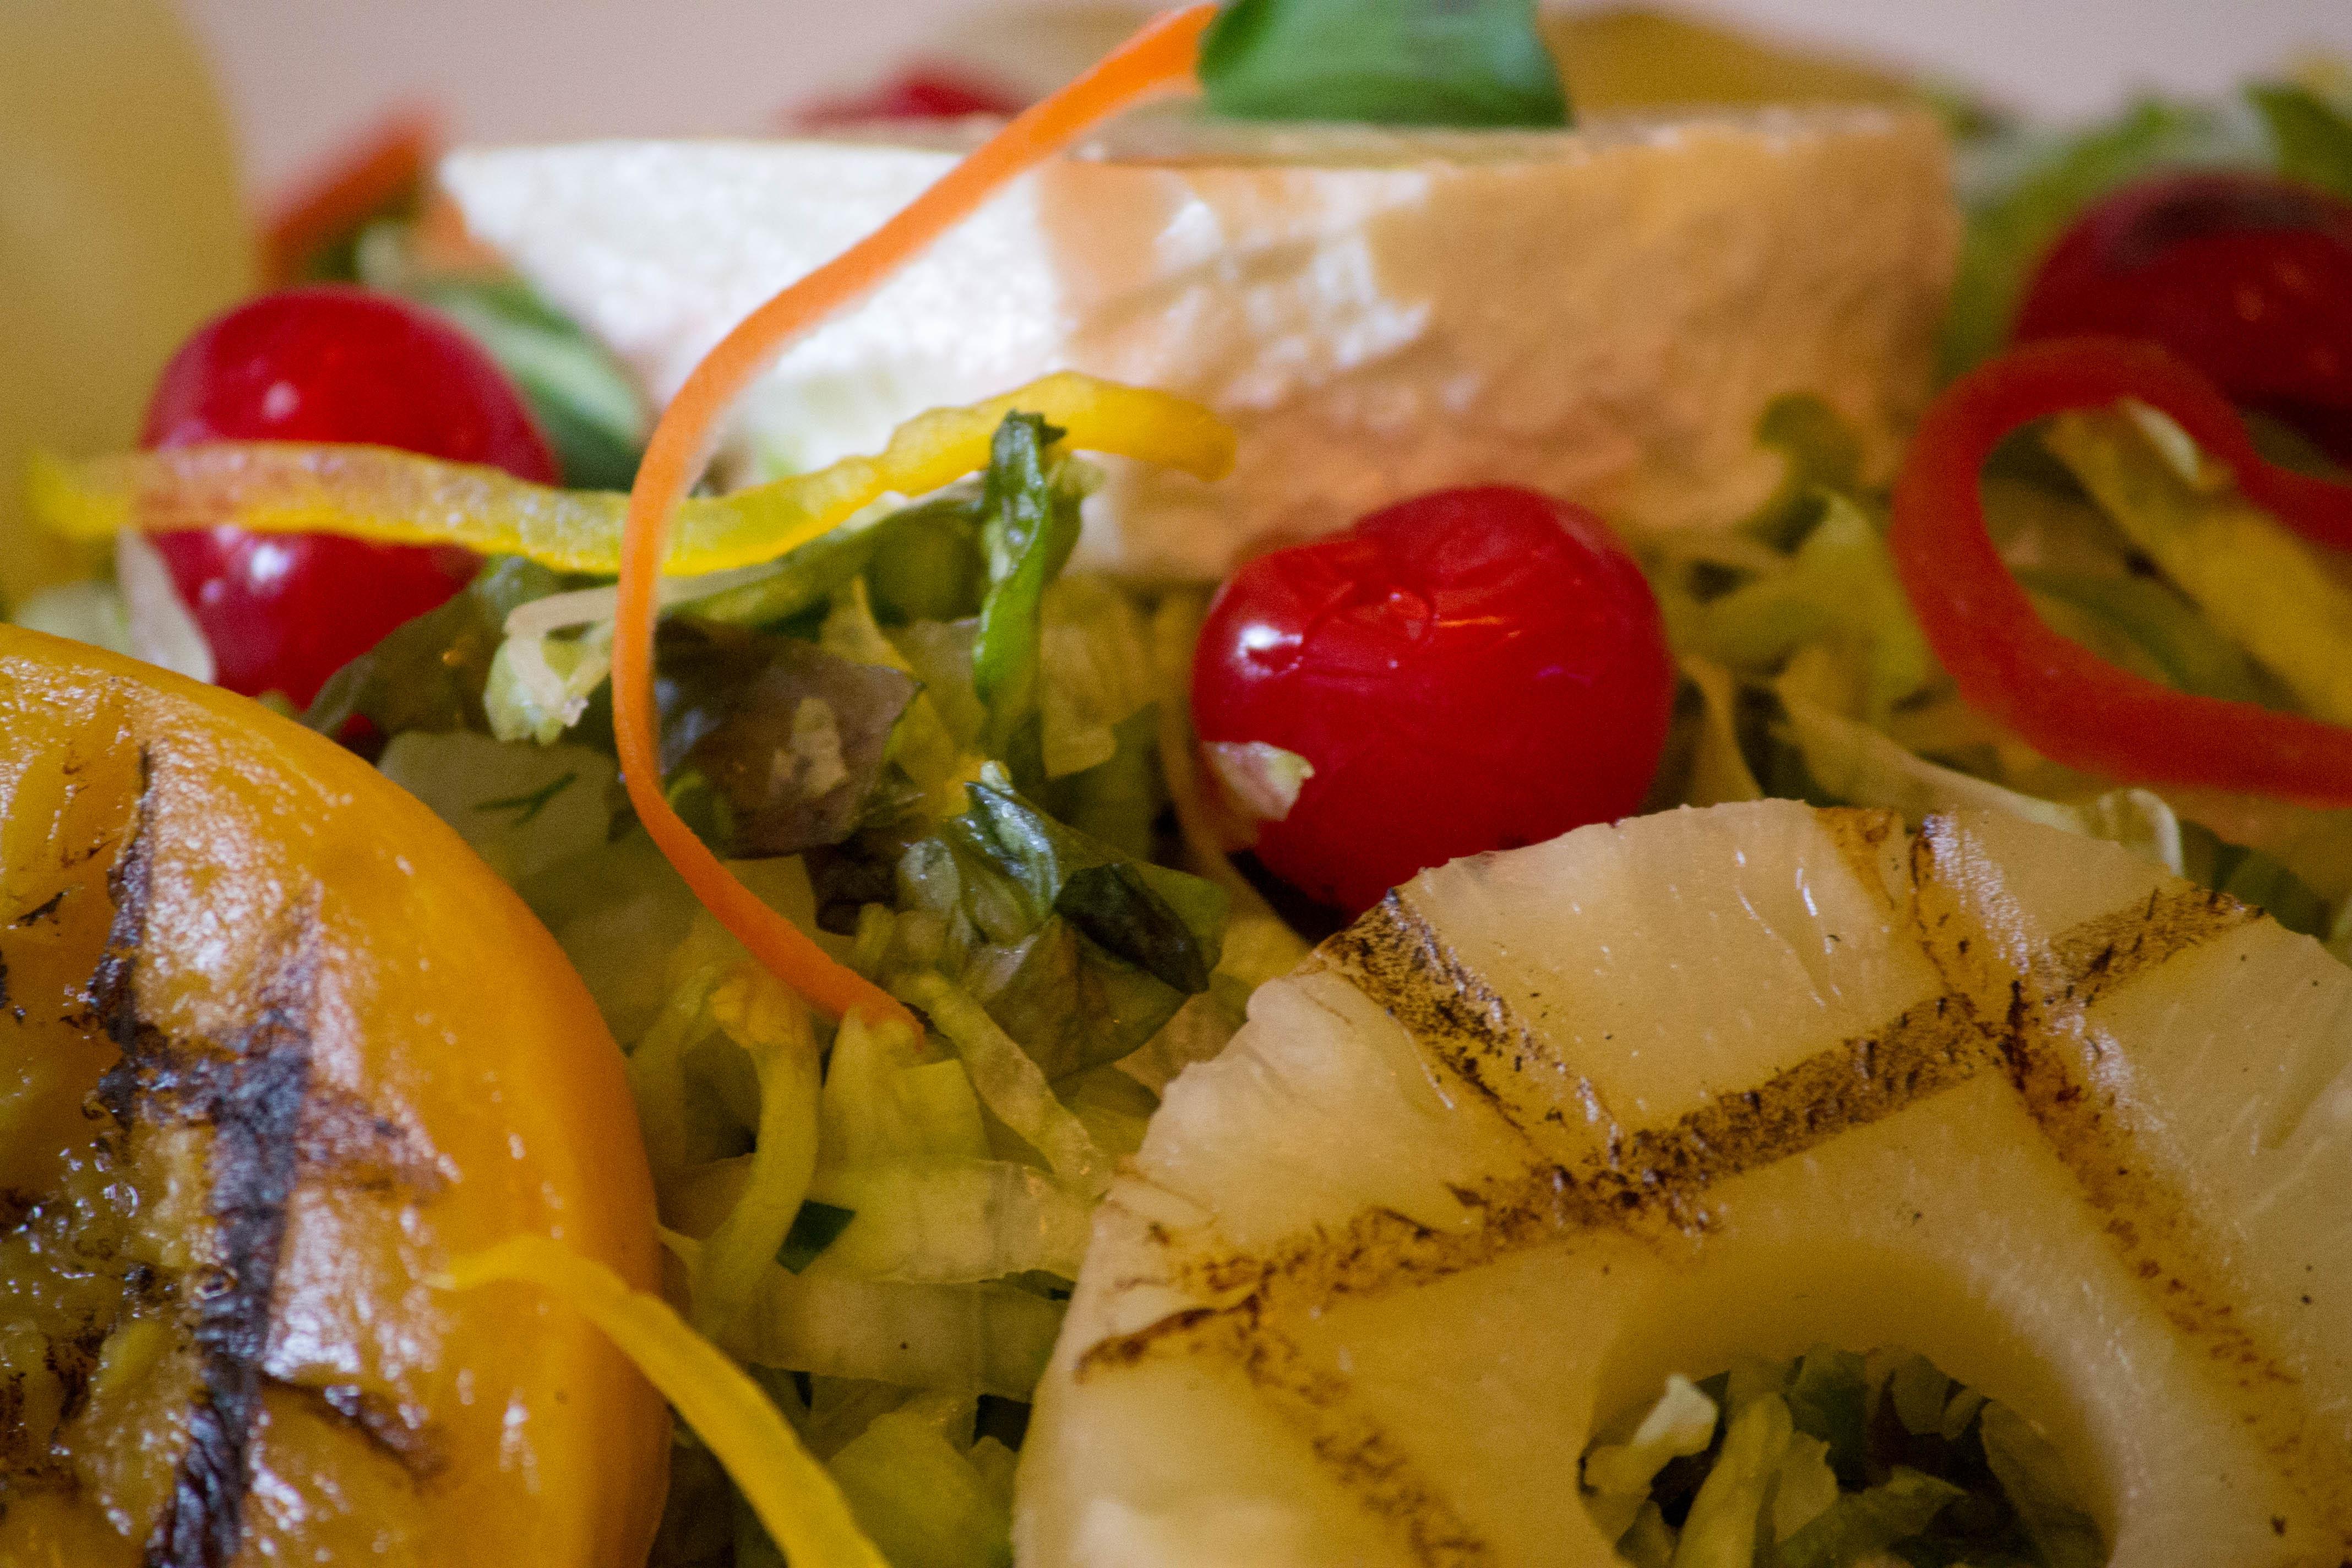 Appetizer salad photo